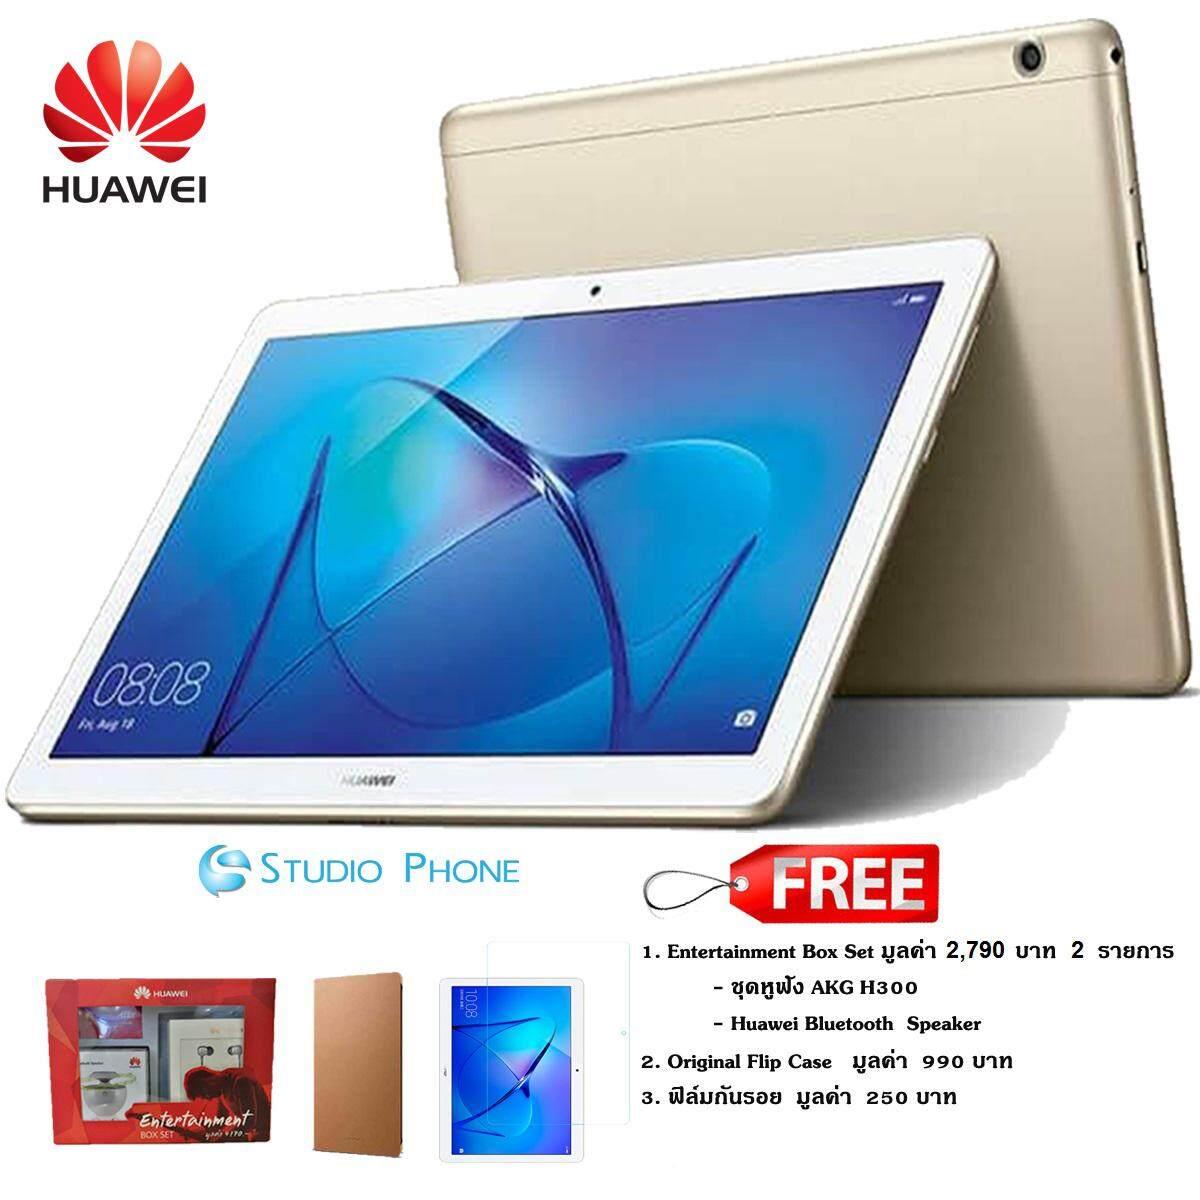 Huawei MediaPad T3 10 AGS-L09 -  (Free Entertainment box set มูลค่า 2,790 บาท + Original flip case มูลค่า 990 บาท + กันรอย มูลค่า 250 บาท)